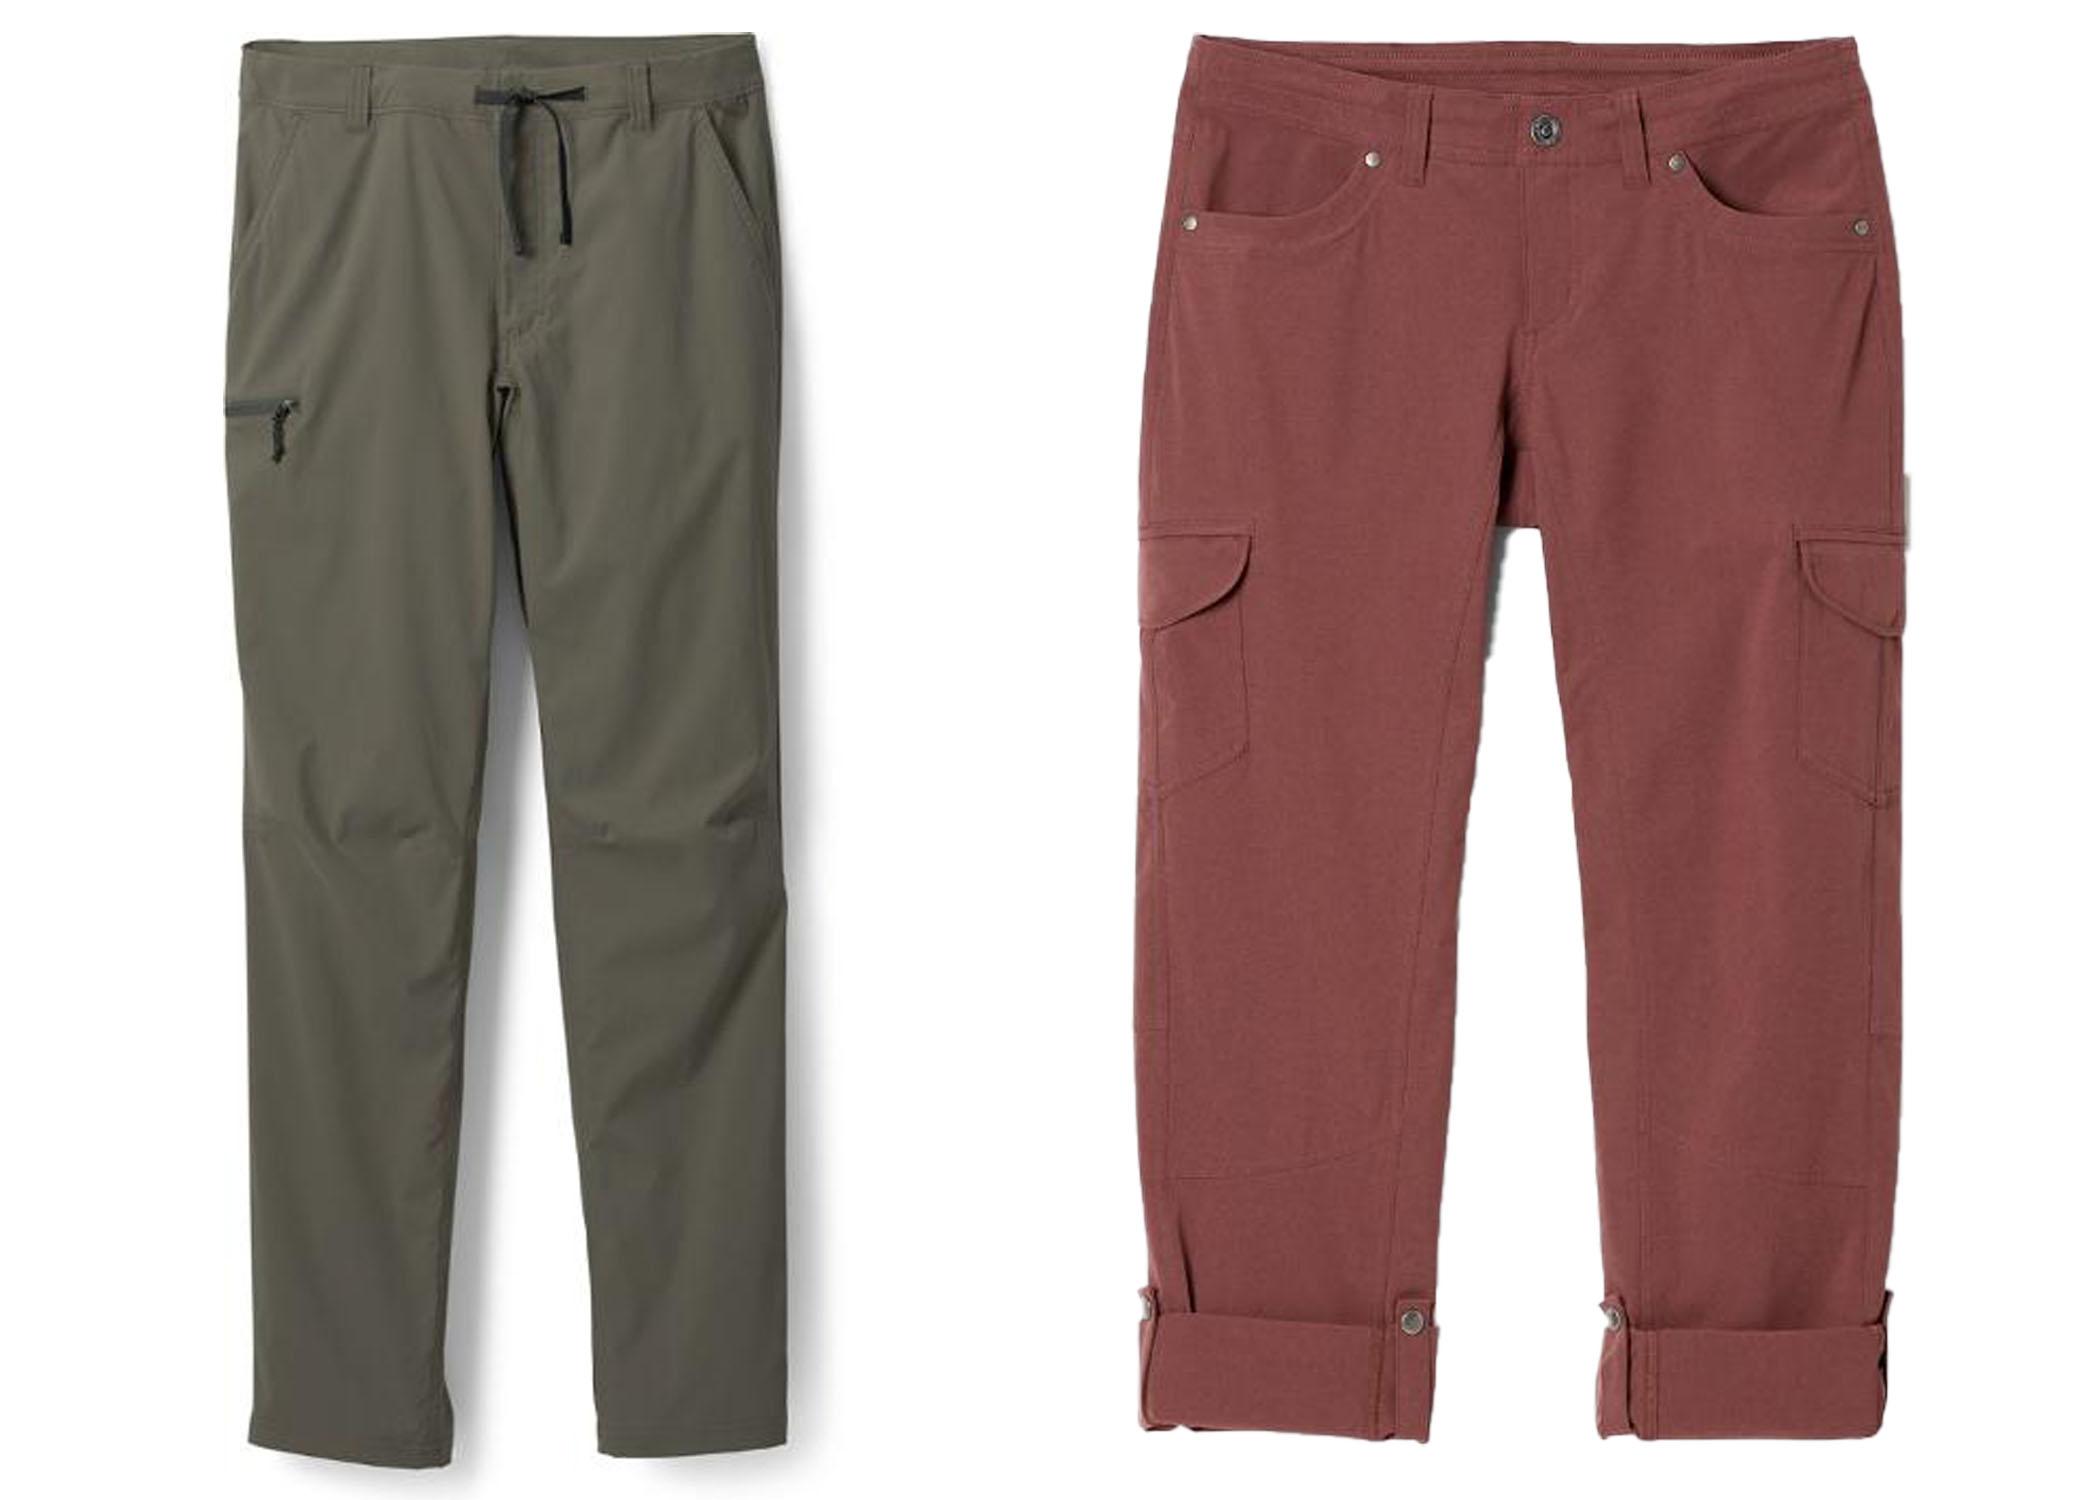 KUHL Roll up women's hiking Pants and REI Sahara Path Men's Hiking Pants